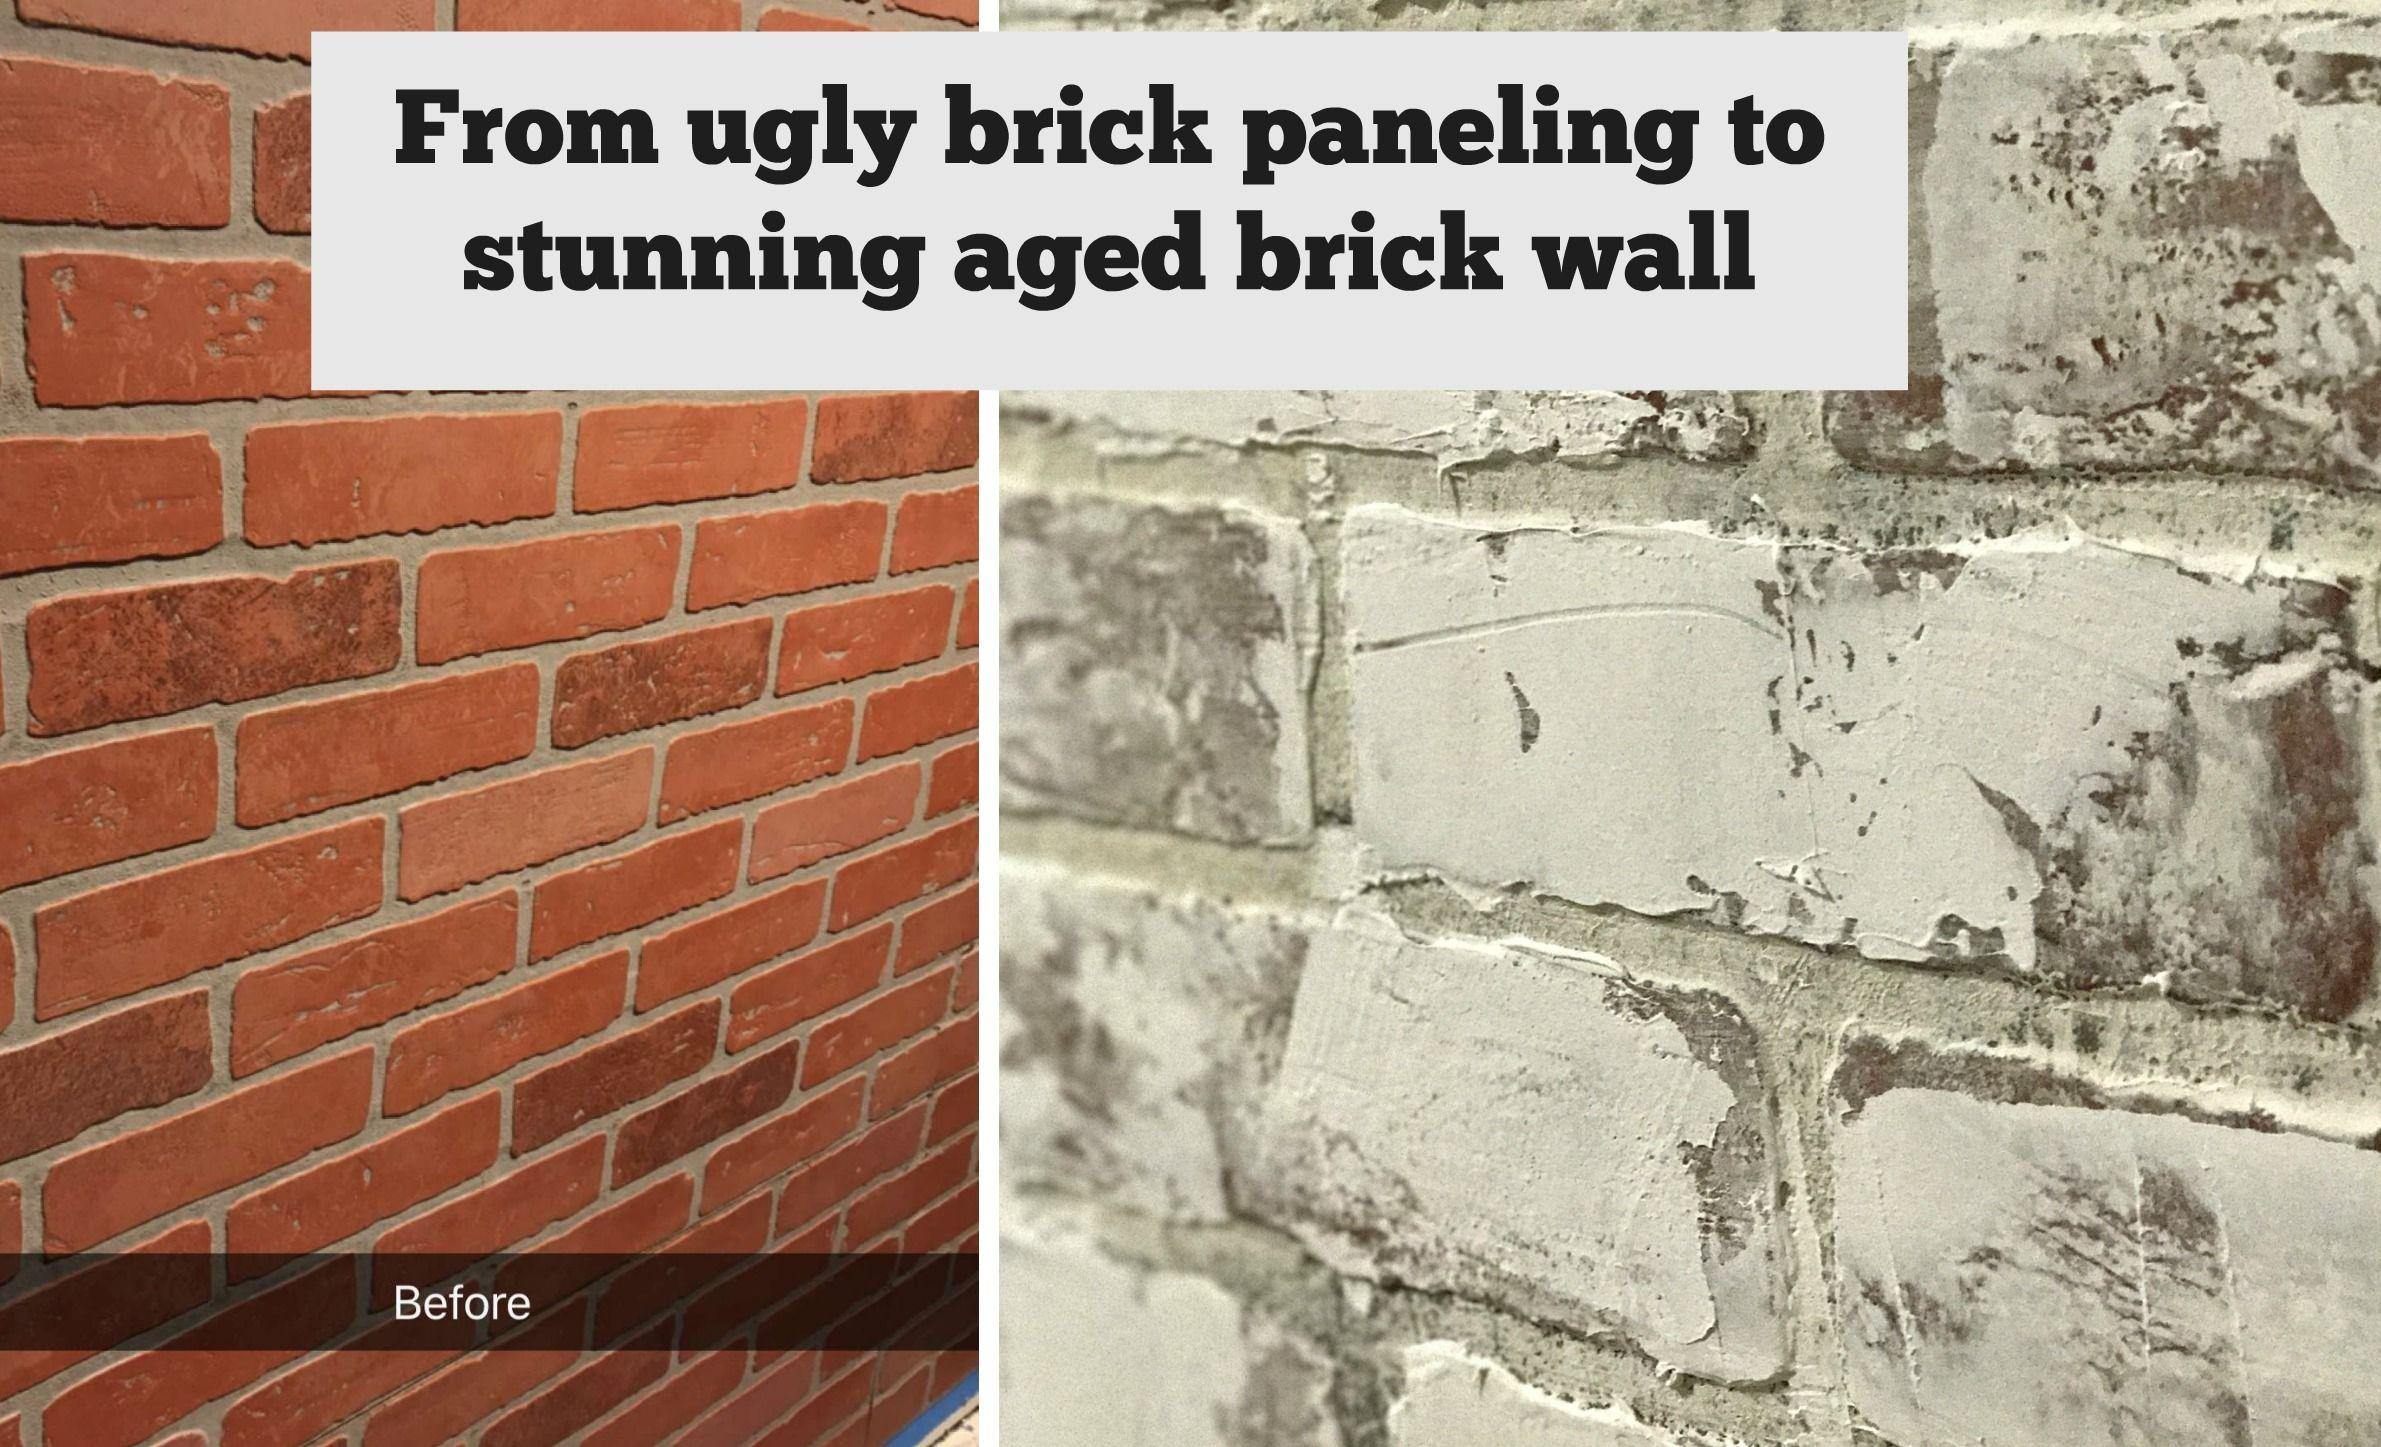 Faux Brick Wall Created From Brick Paneling Brick Wall Faux